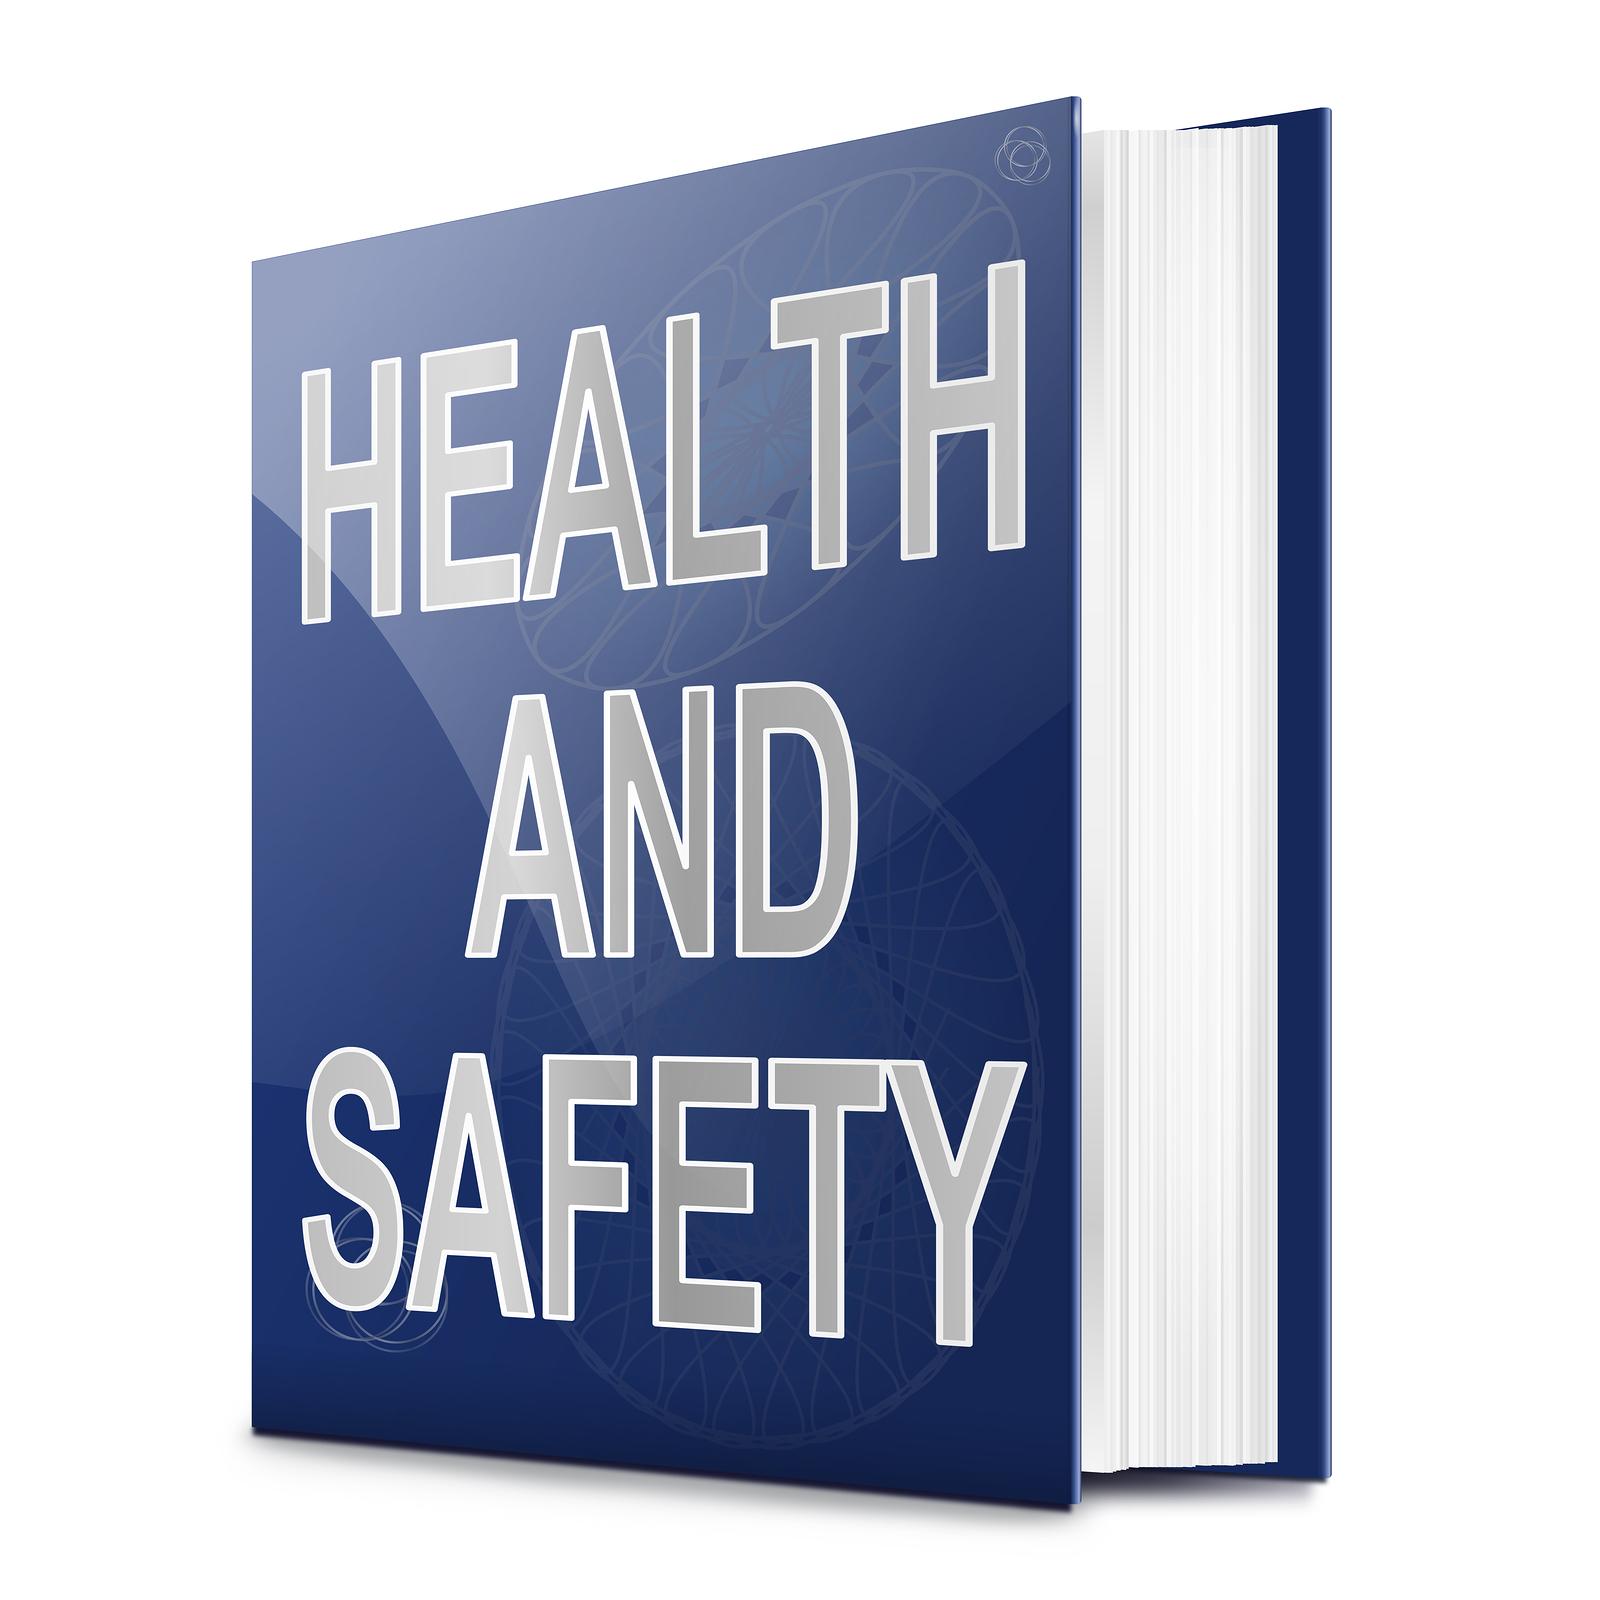 Establishing a safe work environment